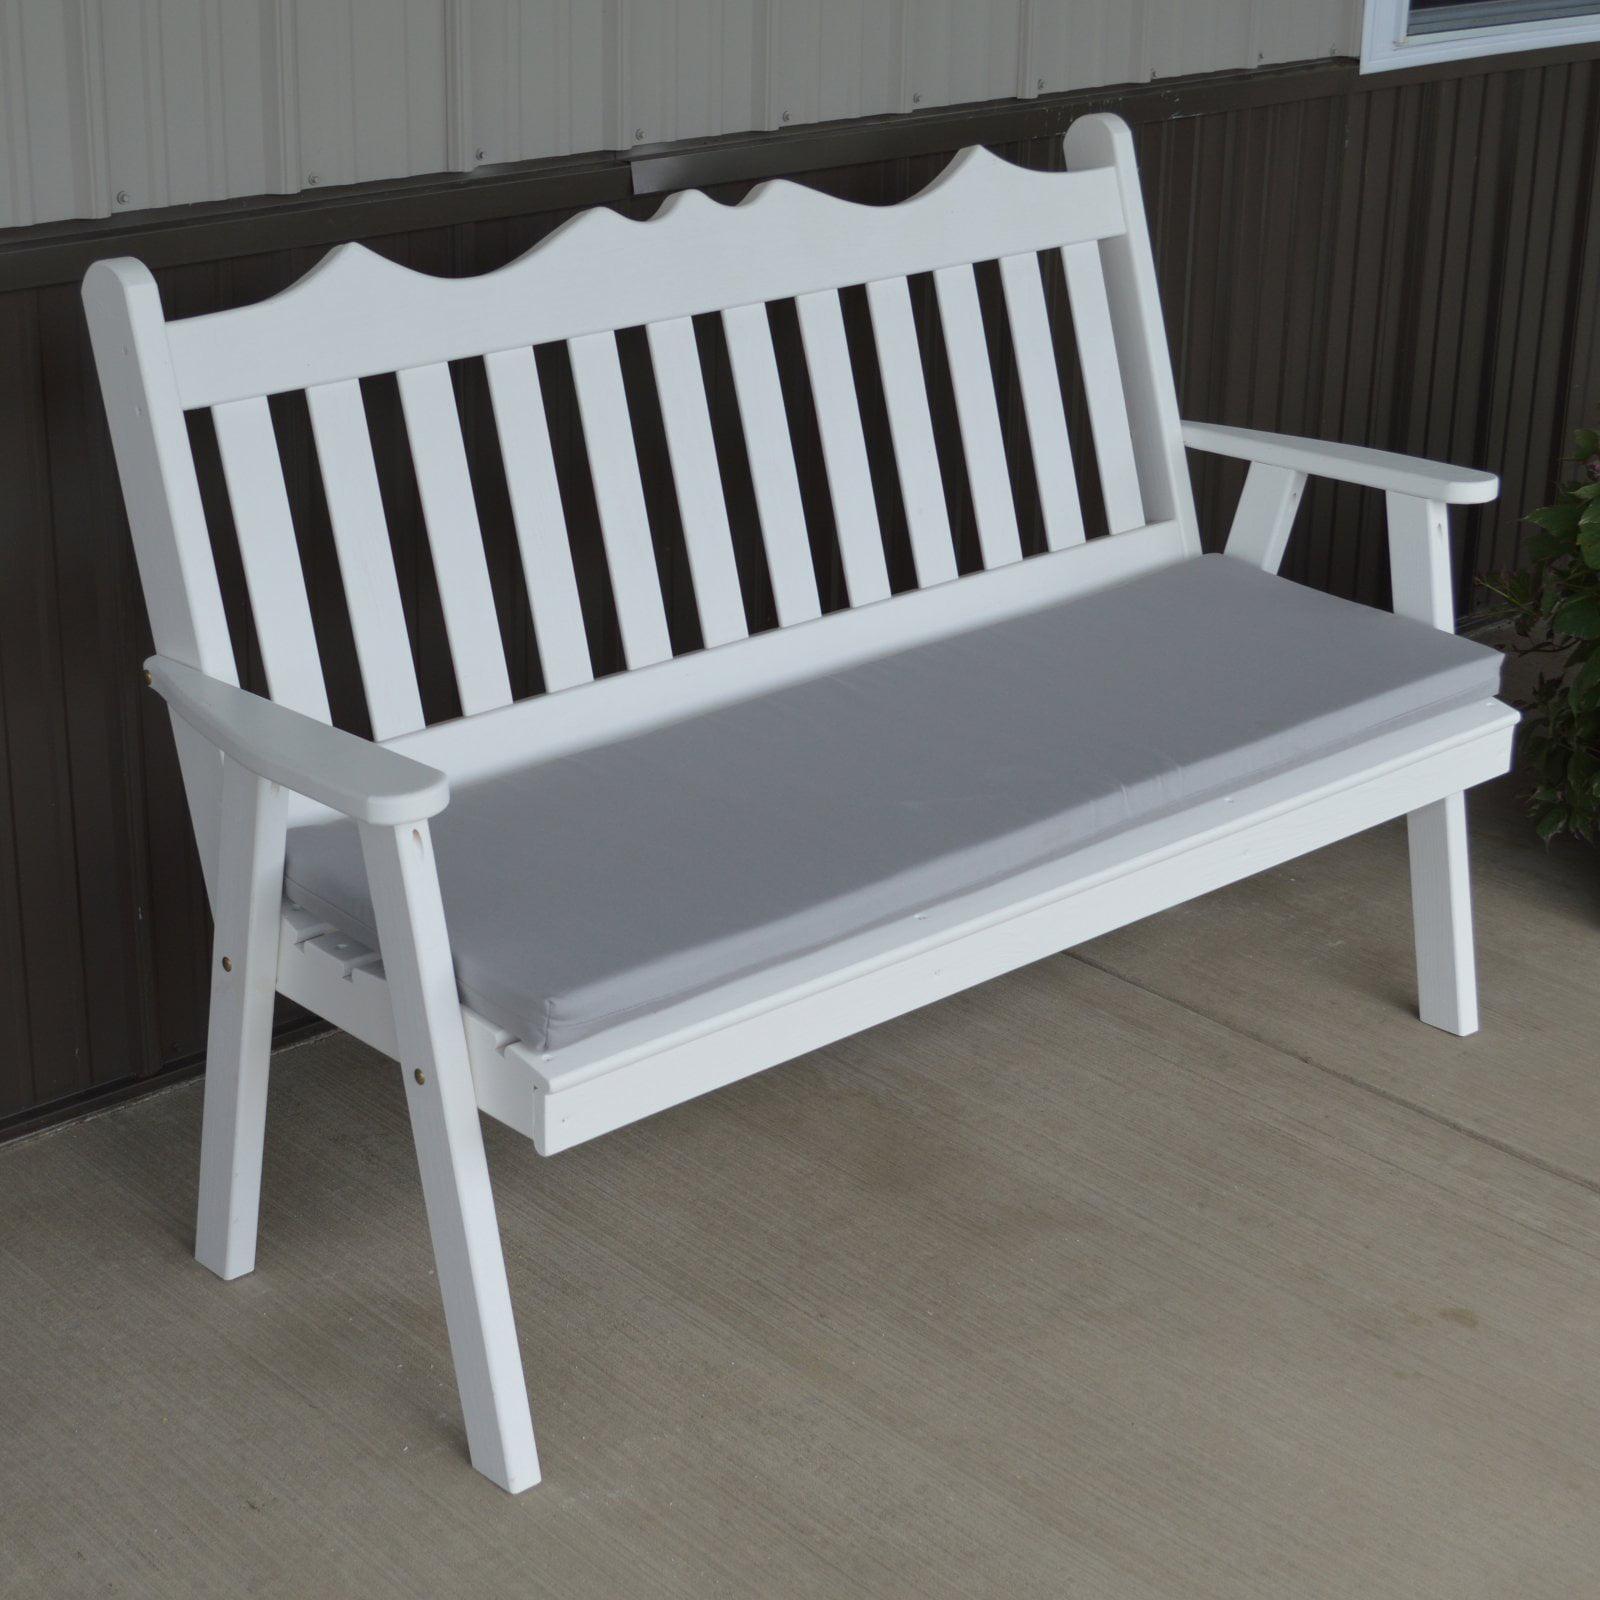 A & L Furniture Yellow Pine Royal English Garden Bench